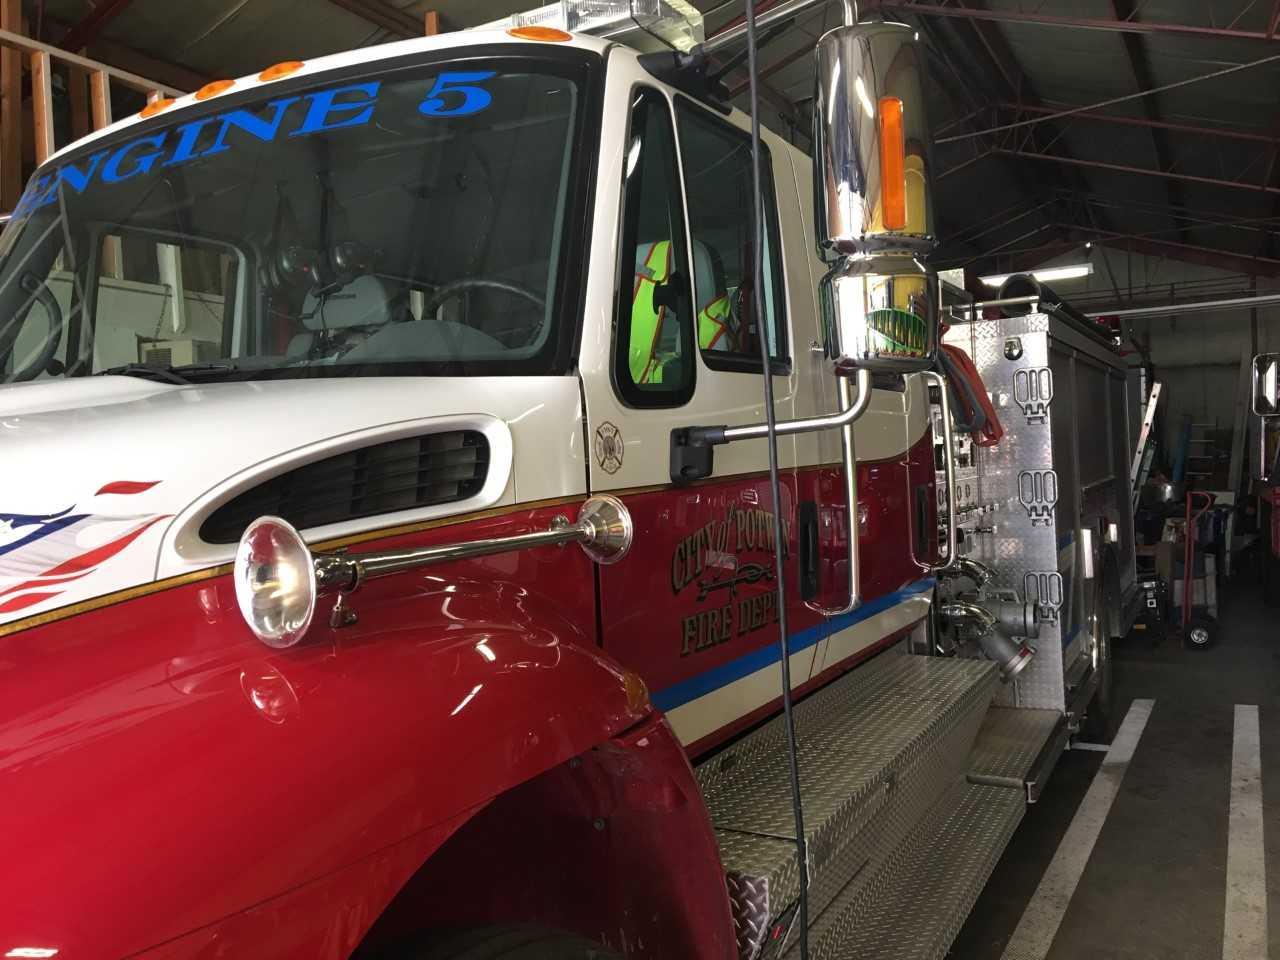 Potwin Fire Department_1519918318952.jpg.jpg